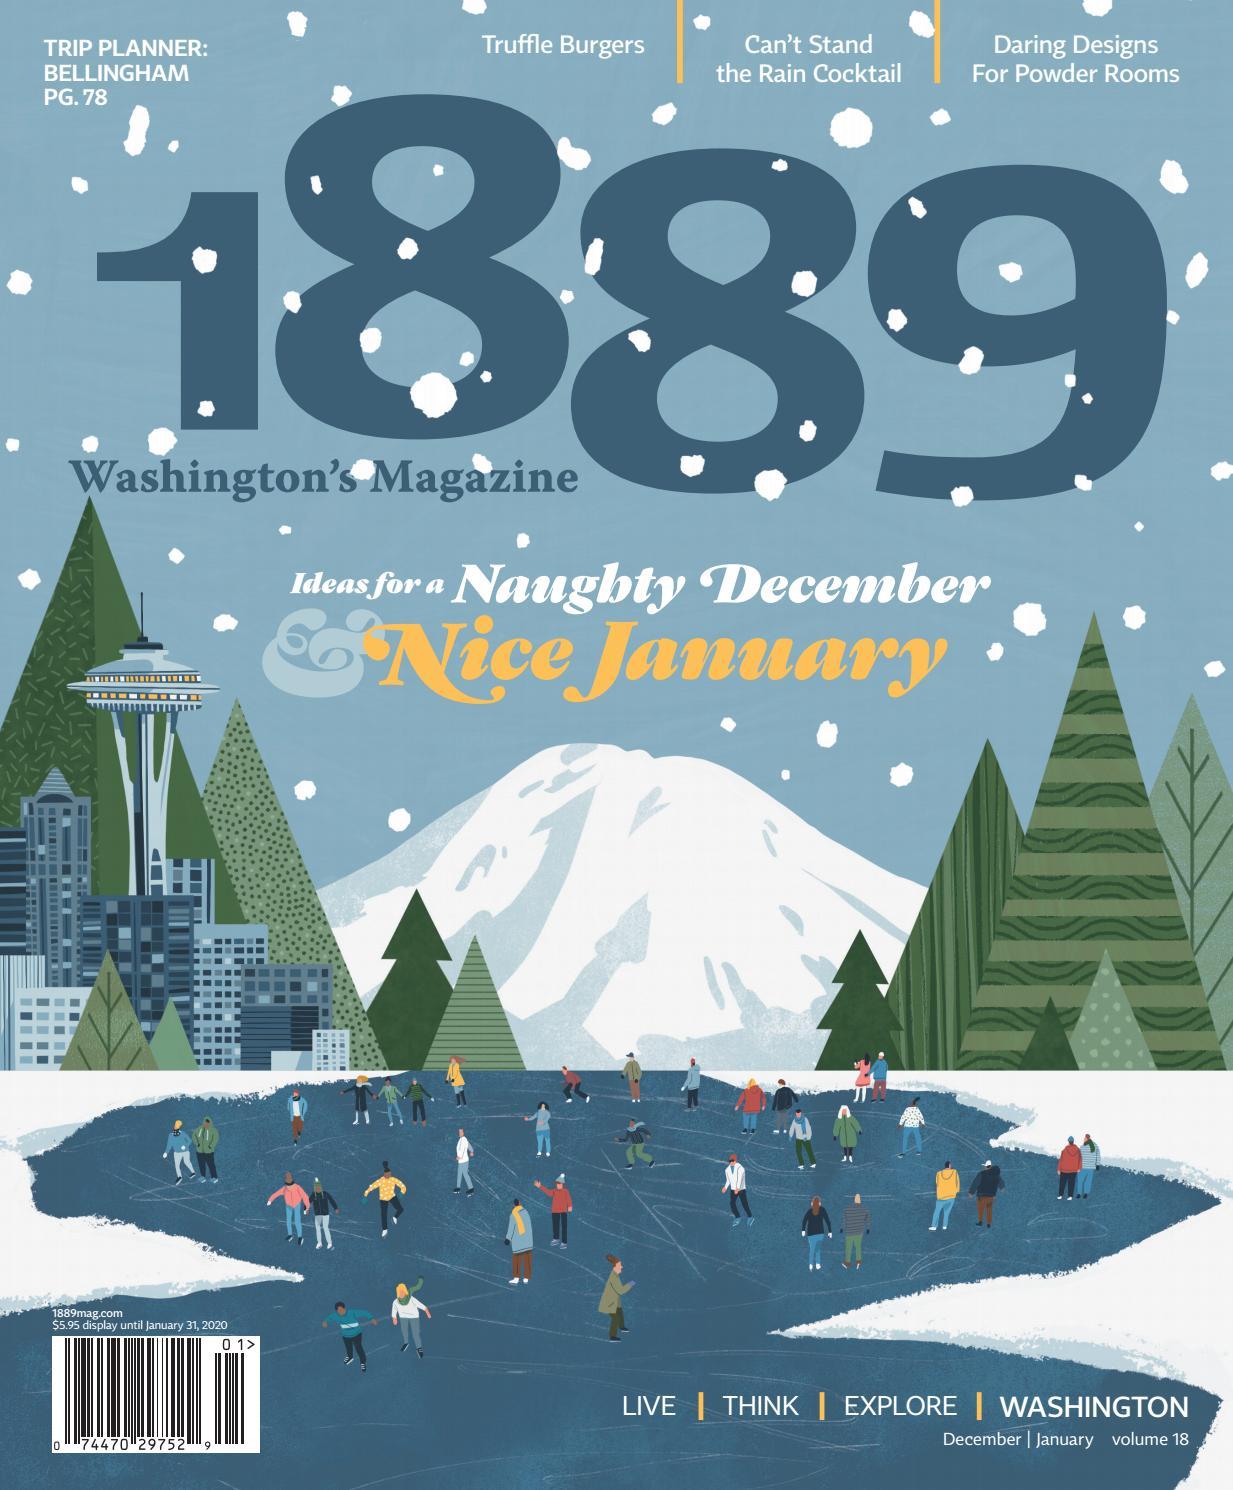 1889 Washington's Magazine | December/January 2019 by Statehood